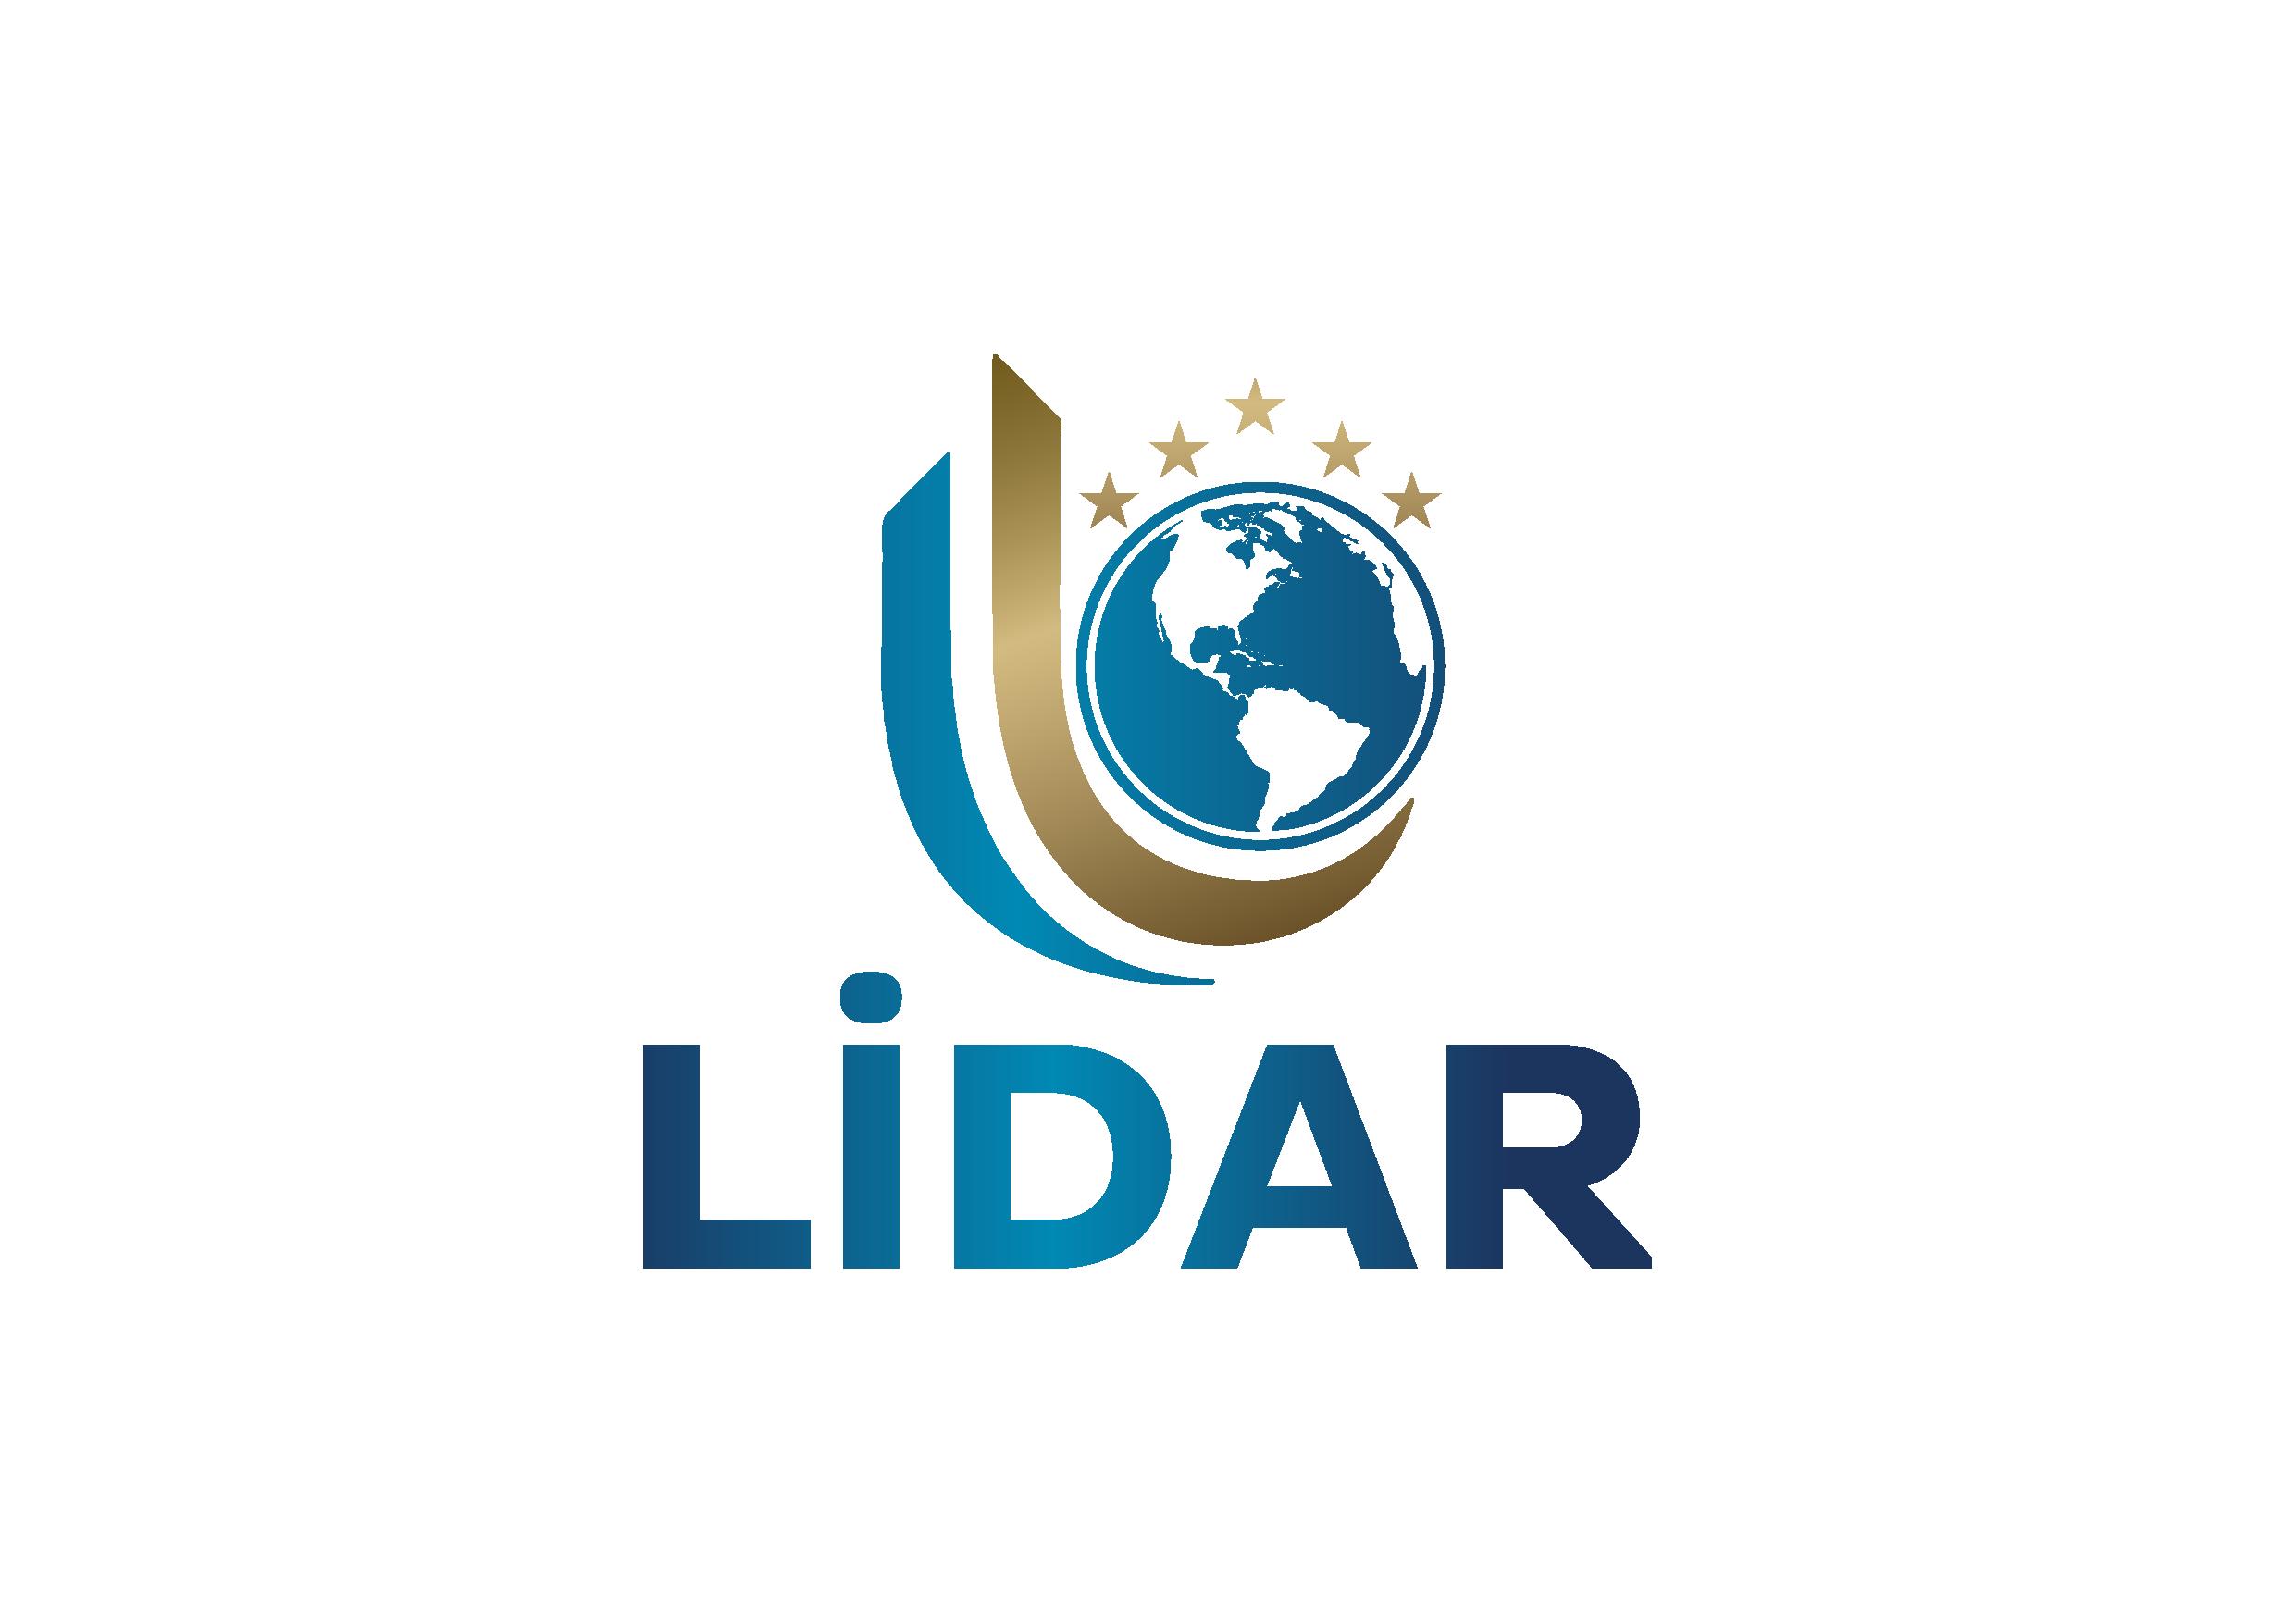 LIDAR GLOBAL MAKINE ITHALAT IHRACAT SANAYI TICARET LIMITED SIRKETI